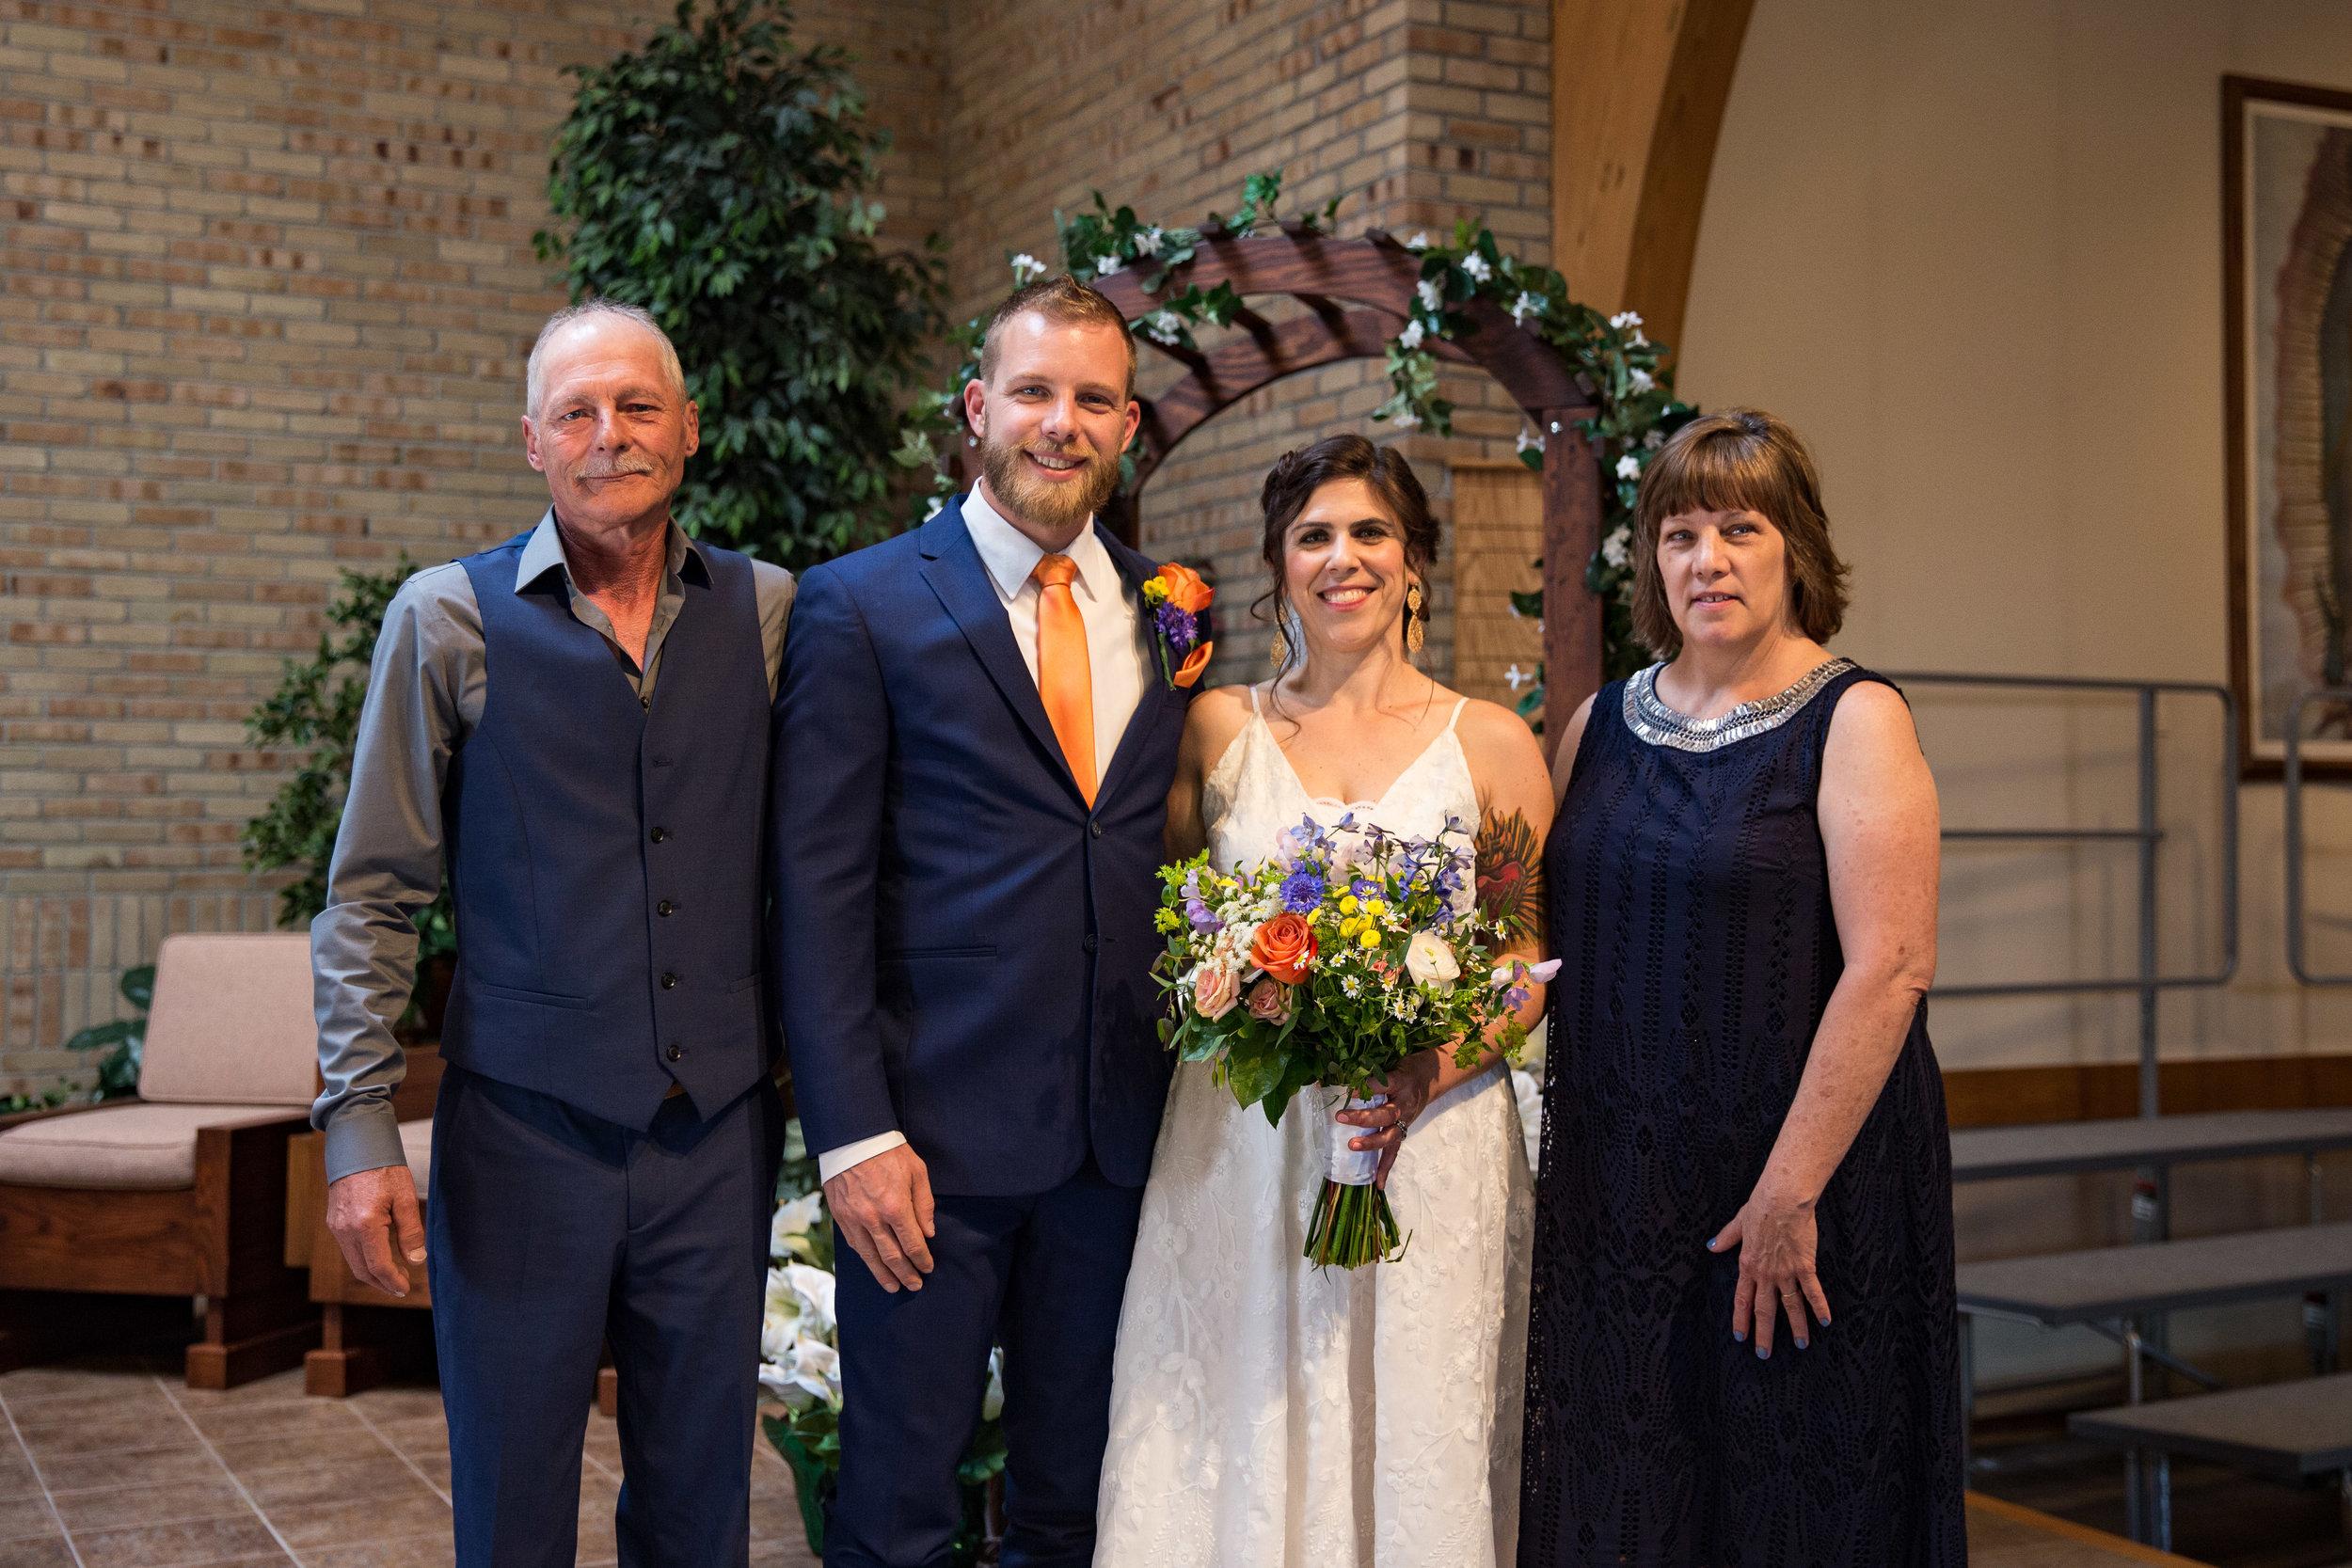 Natalie and Dallas Mooney Wedding 6-8-19_Tania Watt Photography-184.jpg